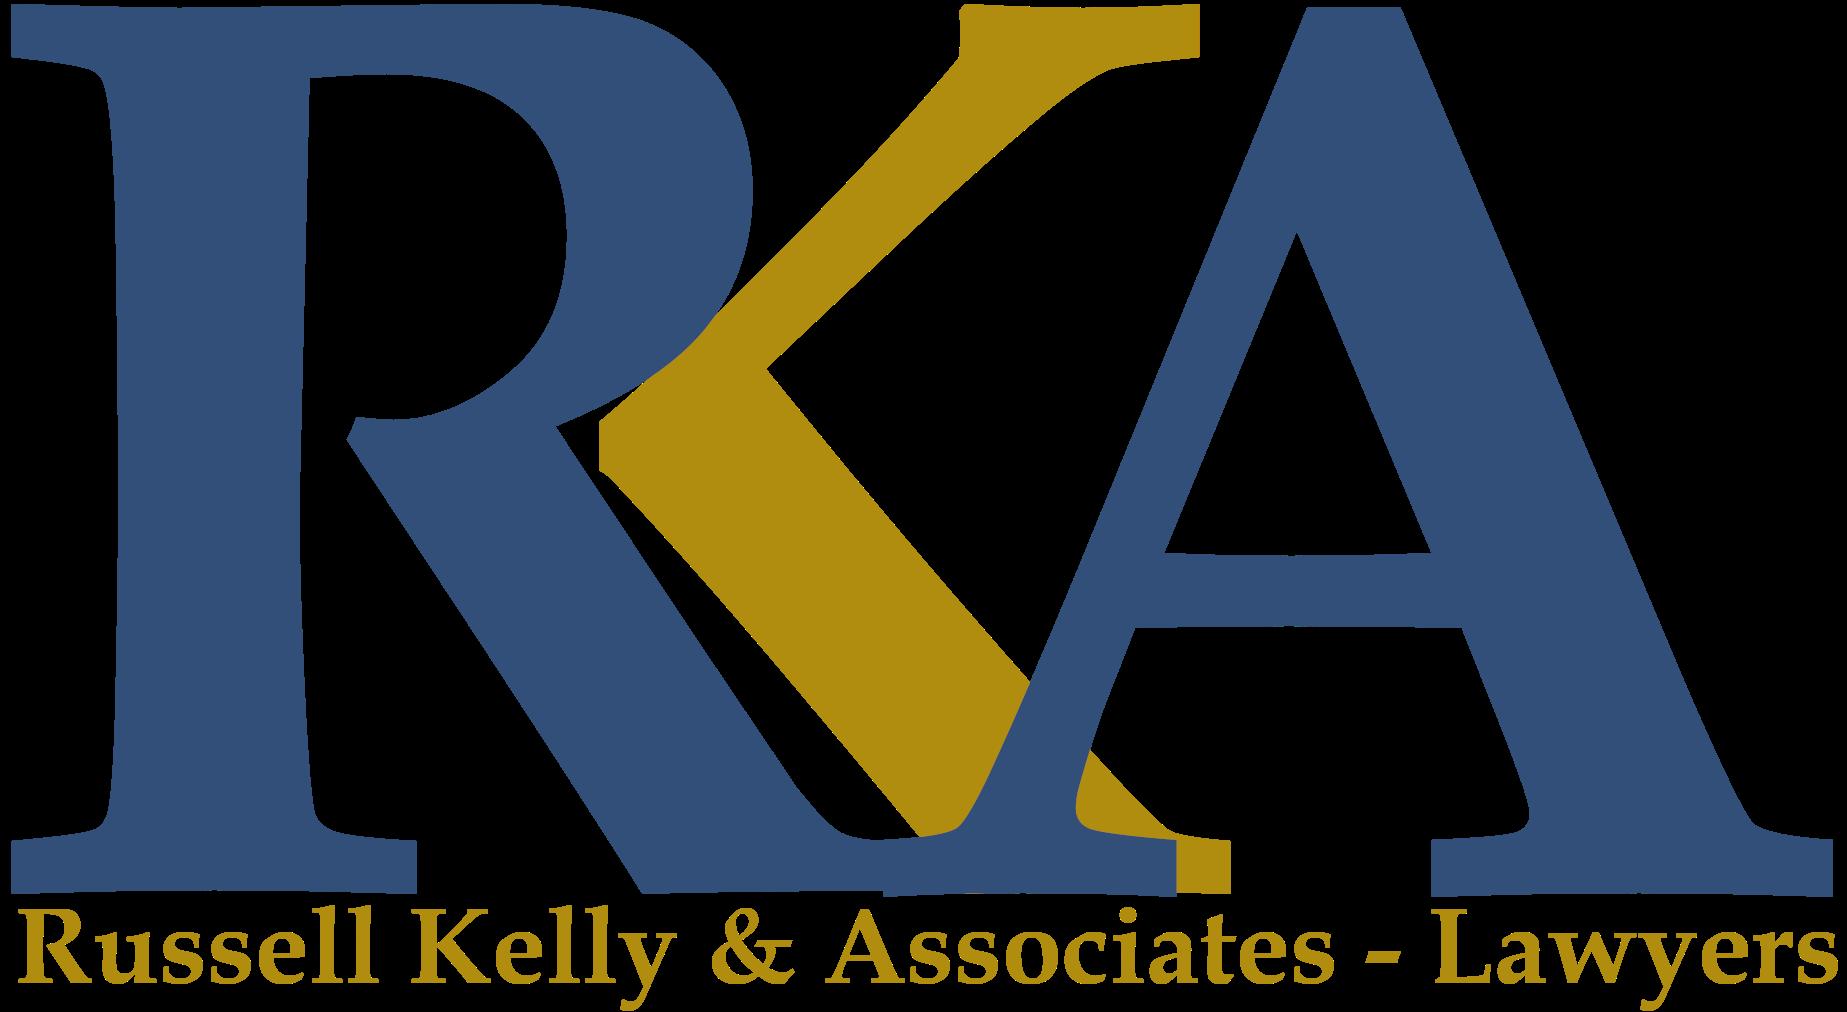 Russell Kelly & Associates